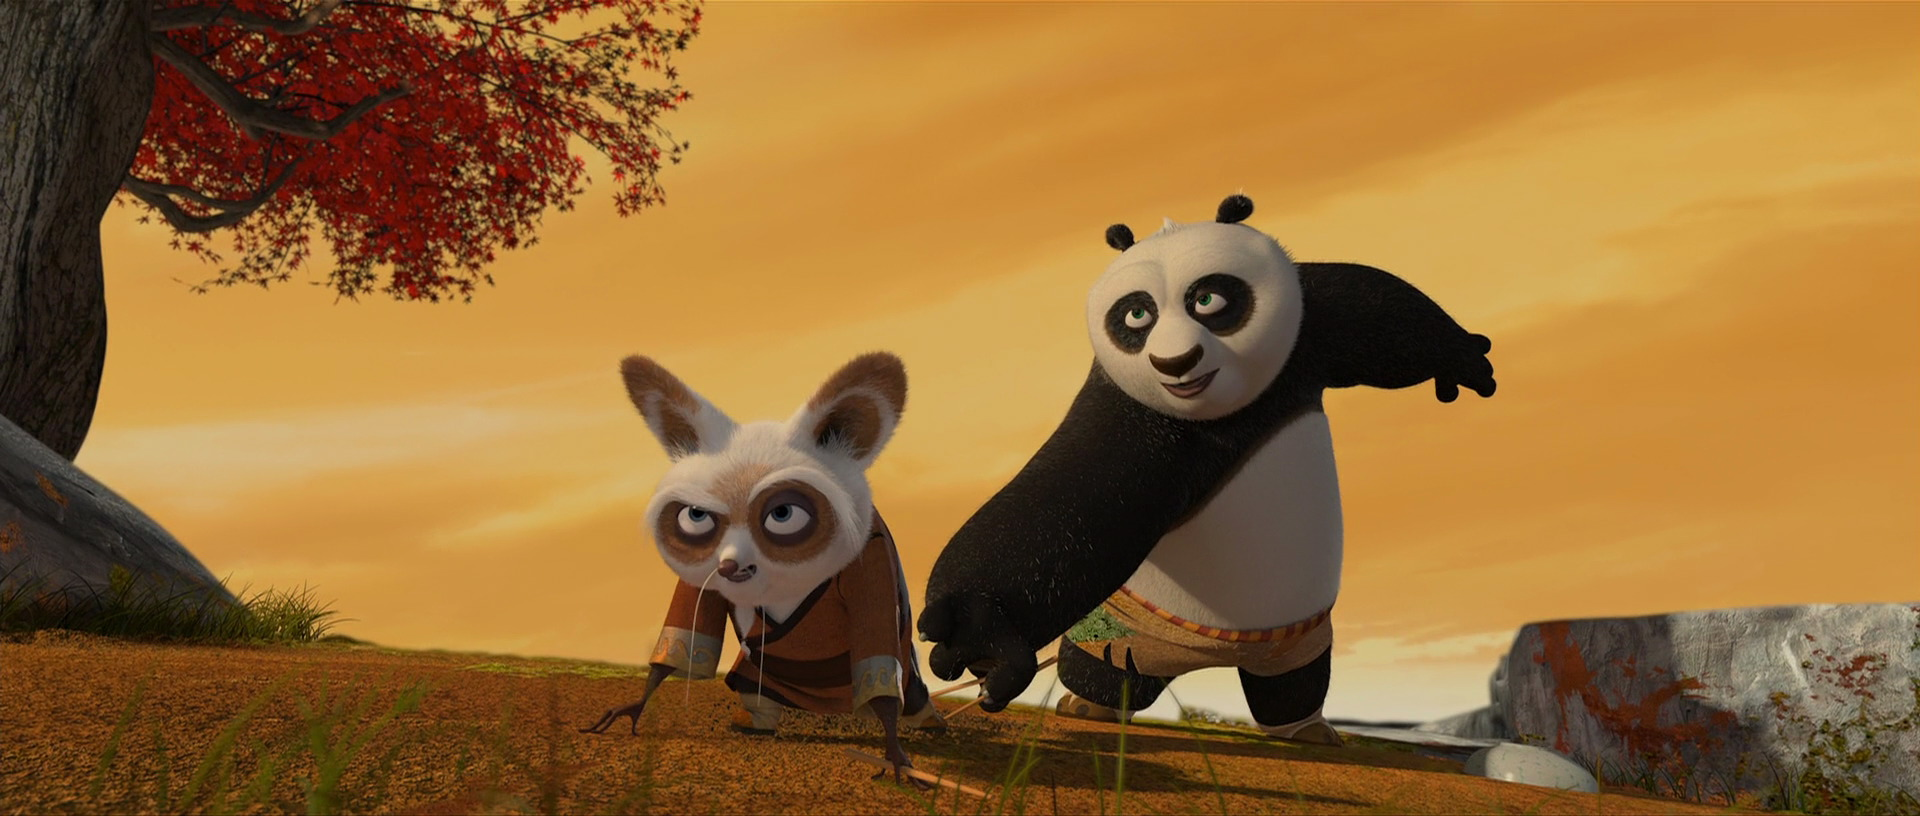 20 Best Animated 3d Movie List Tgif This Grandma Is Fun